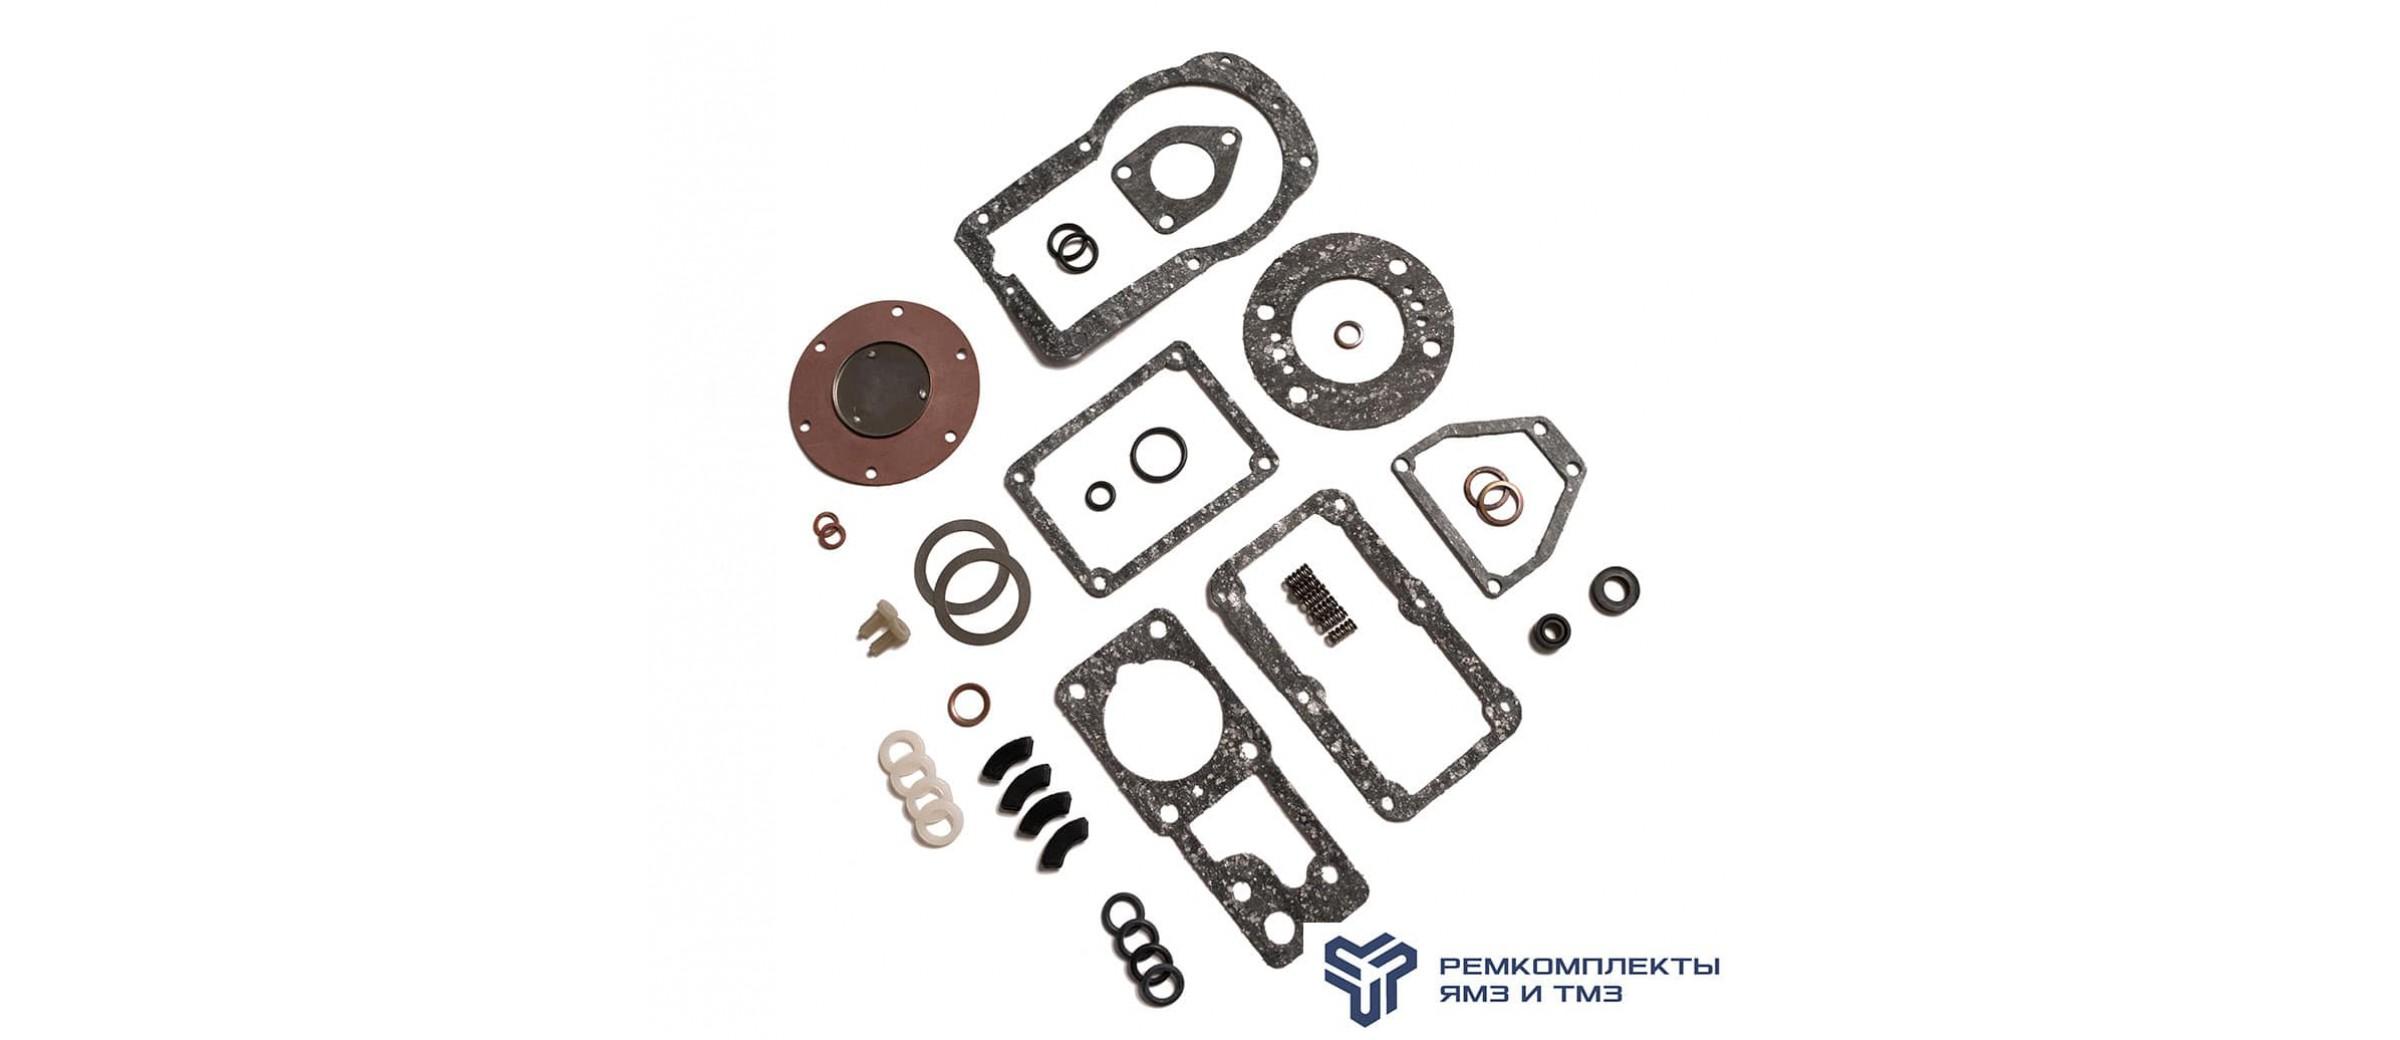 Ремкомплект ТНВД 4УТНИ(М) - Т (РТИ, паронит,медь,пластик)